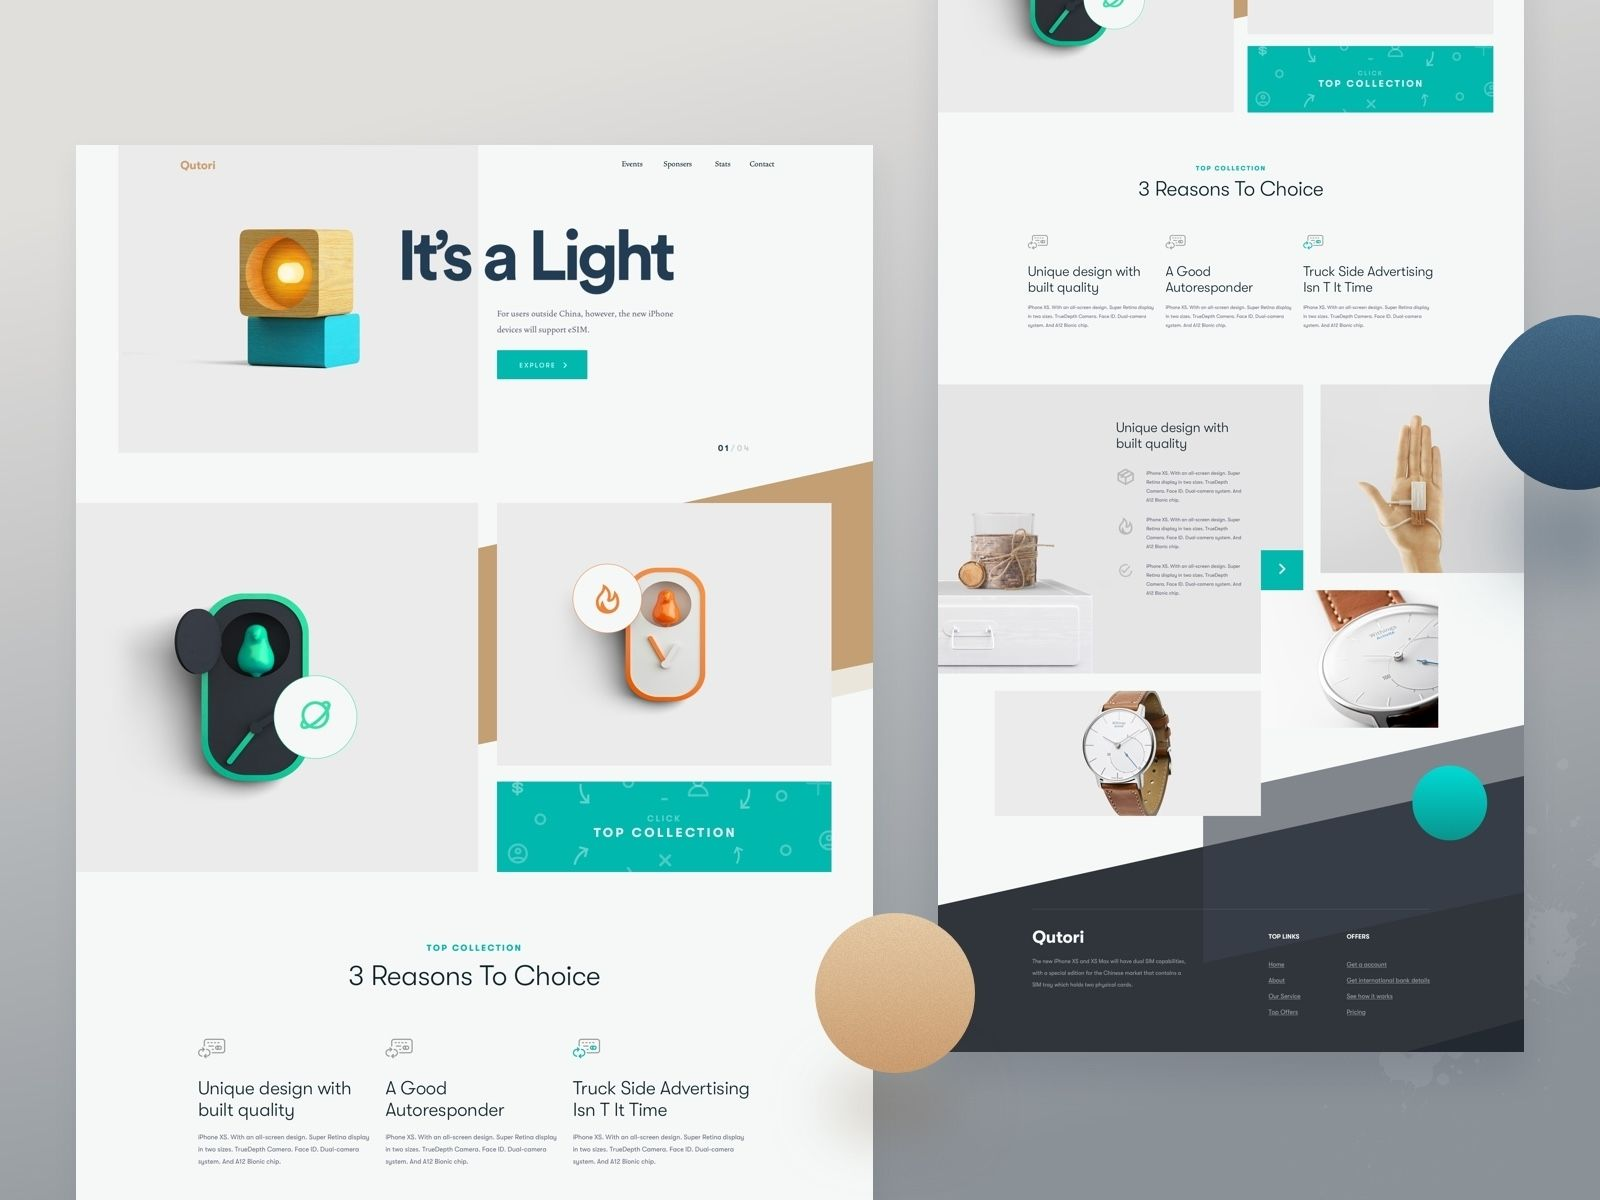 20 web design trends for 2019 | Design | Web design trends